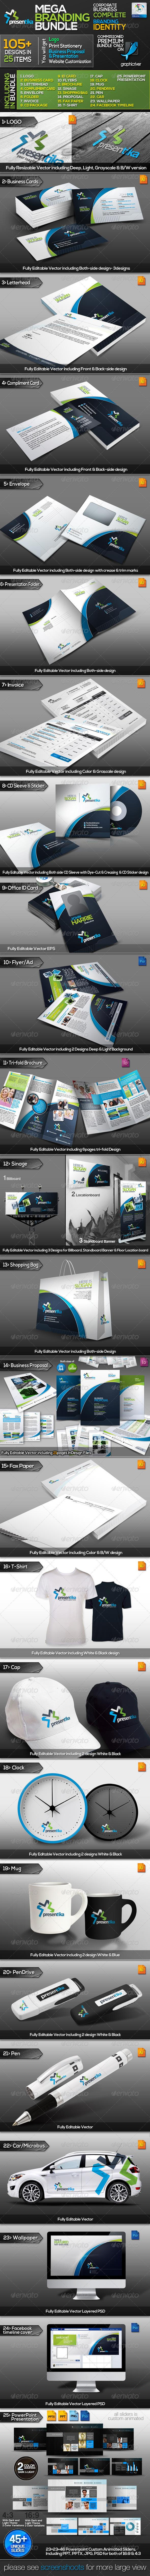 GraphicRiver Presentica Business Identity Mega Branding Bundle 2994870